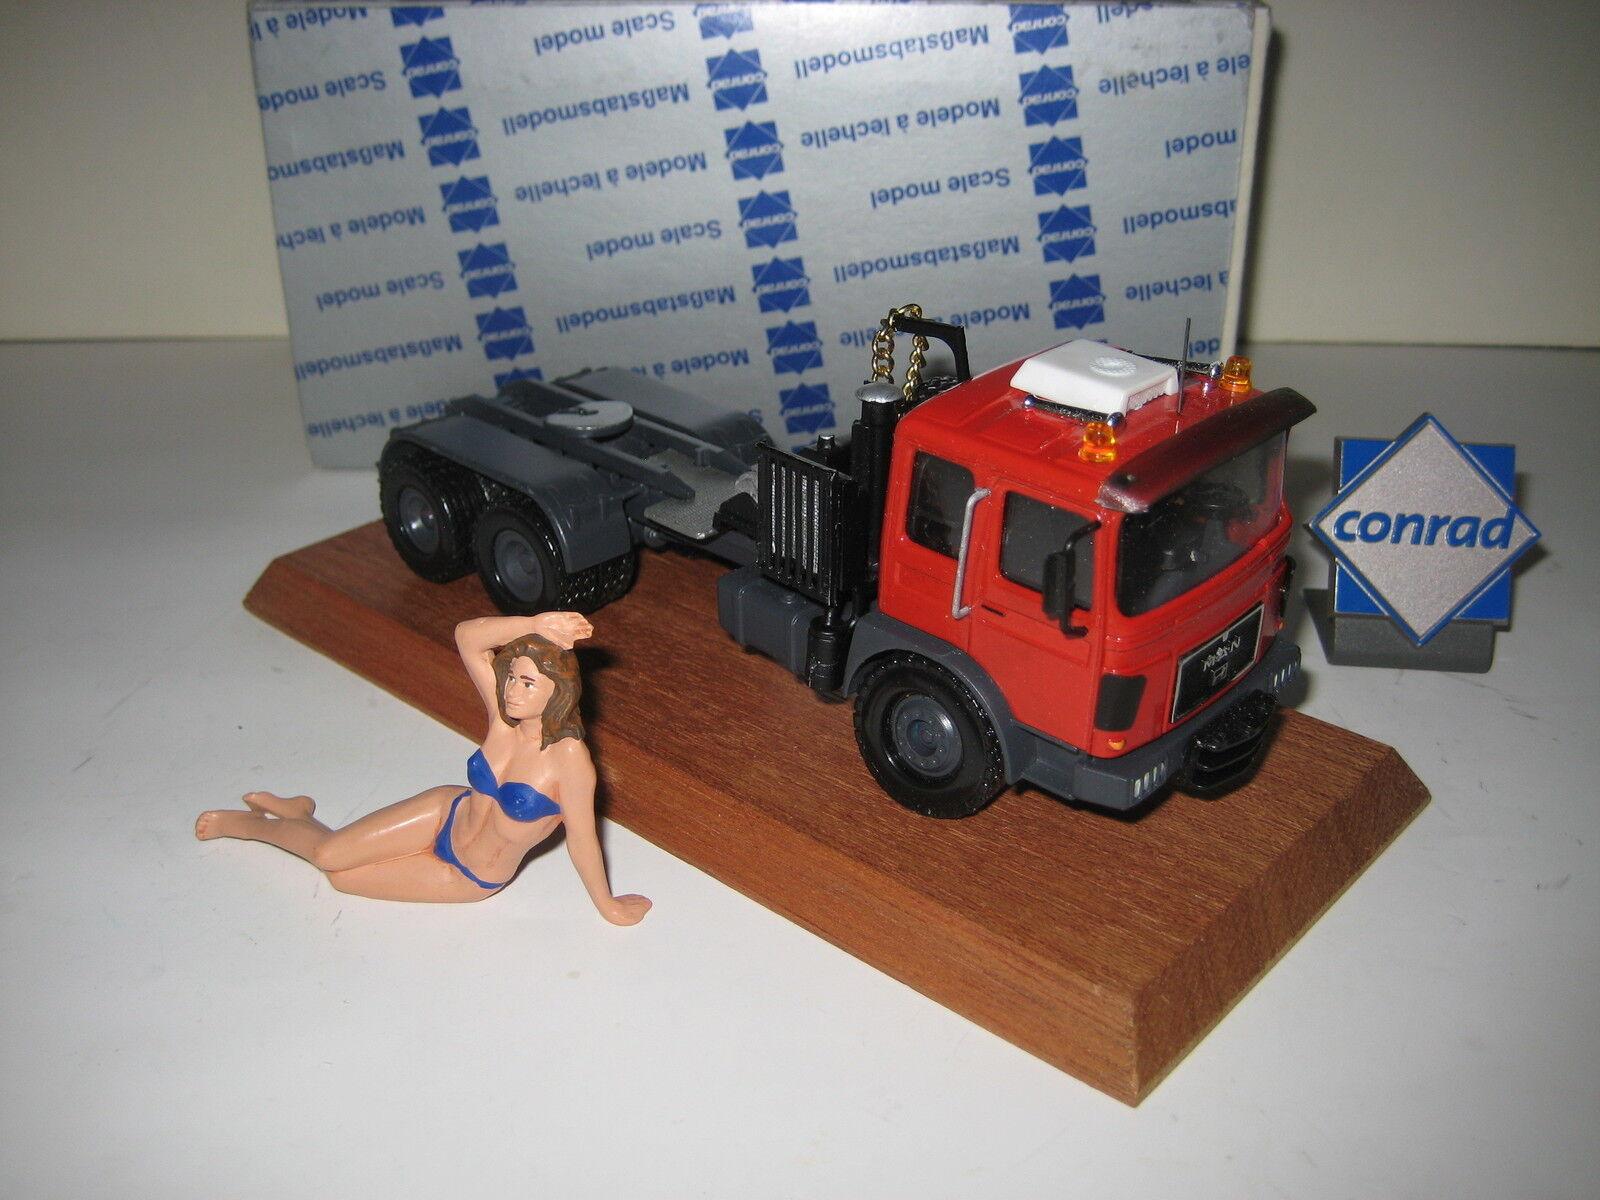 On F 8 4-Axe tracteur    3109 CONRAD 1 50 rare neuf dans sa boîte 9d30ee